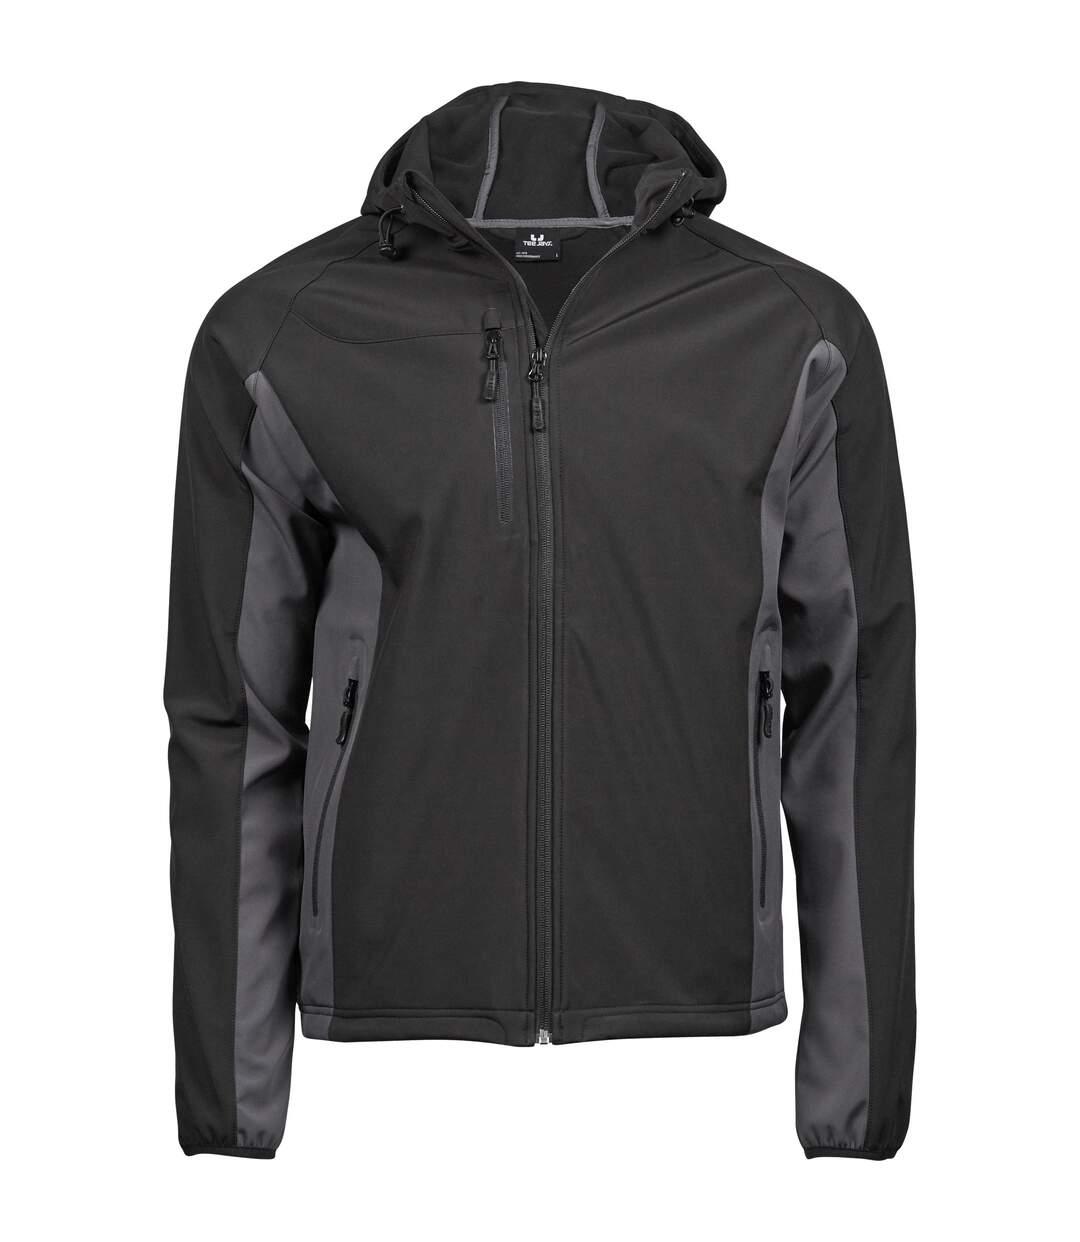 Tee Jays Mens Lightweight Performance Hooded Soft Shell Jacket (Black/Dark Grey) - UTPC3431